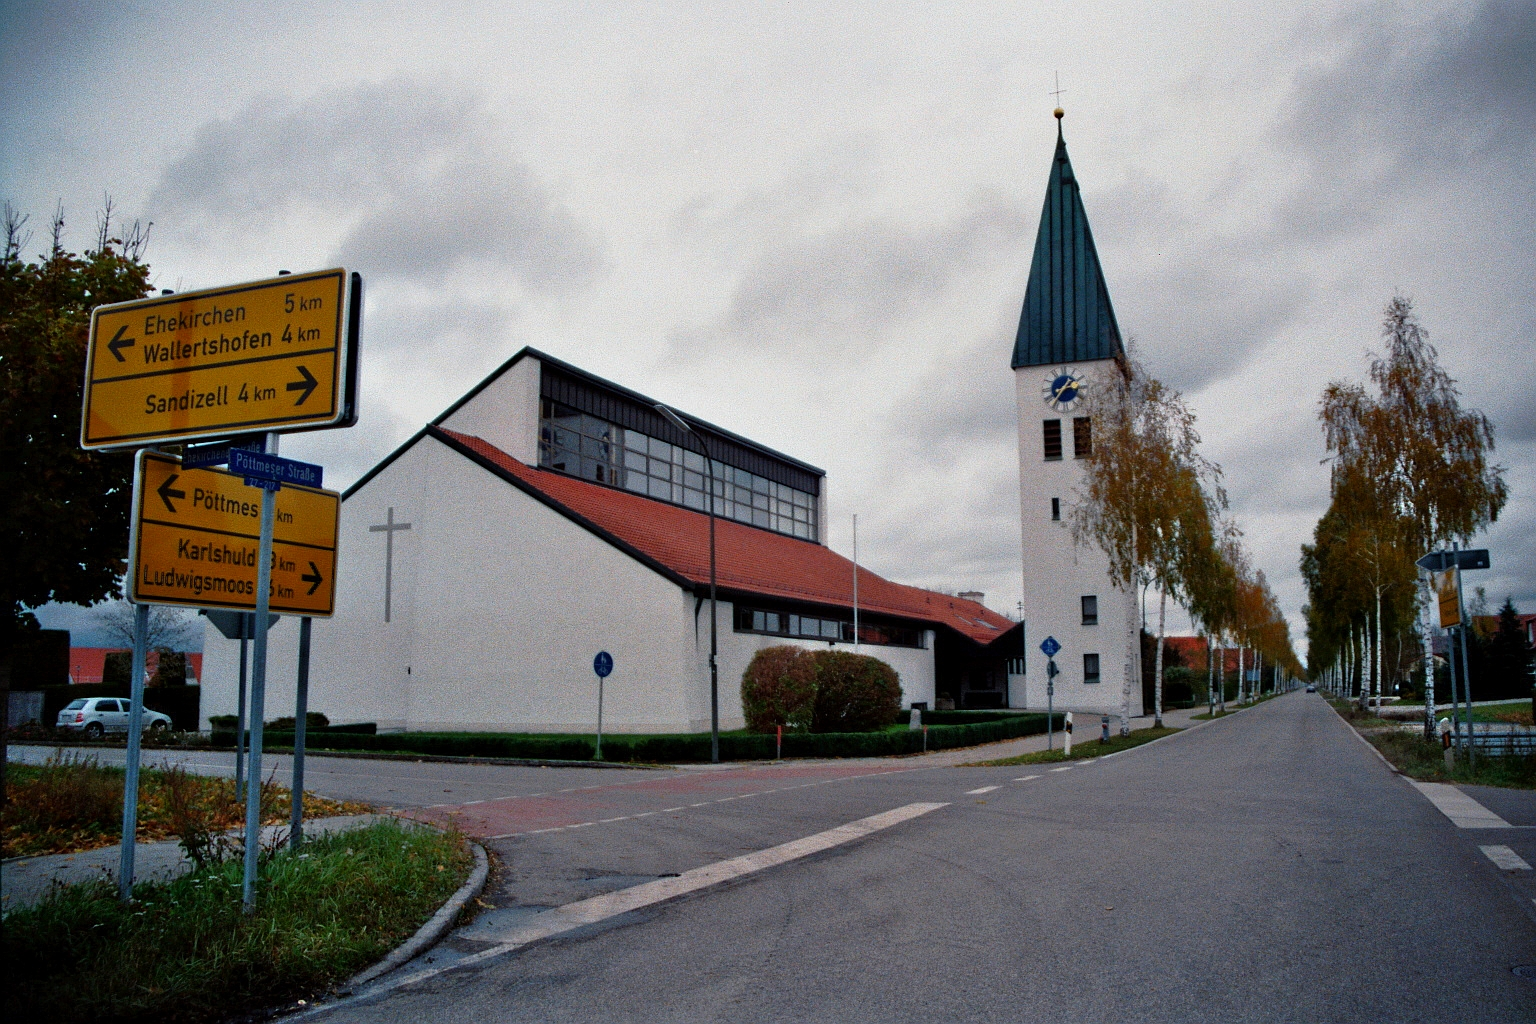 Klingsmoos - Wikipedia